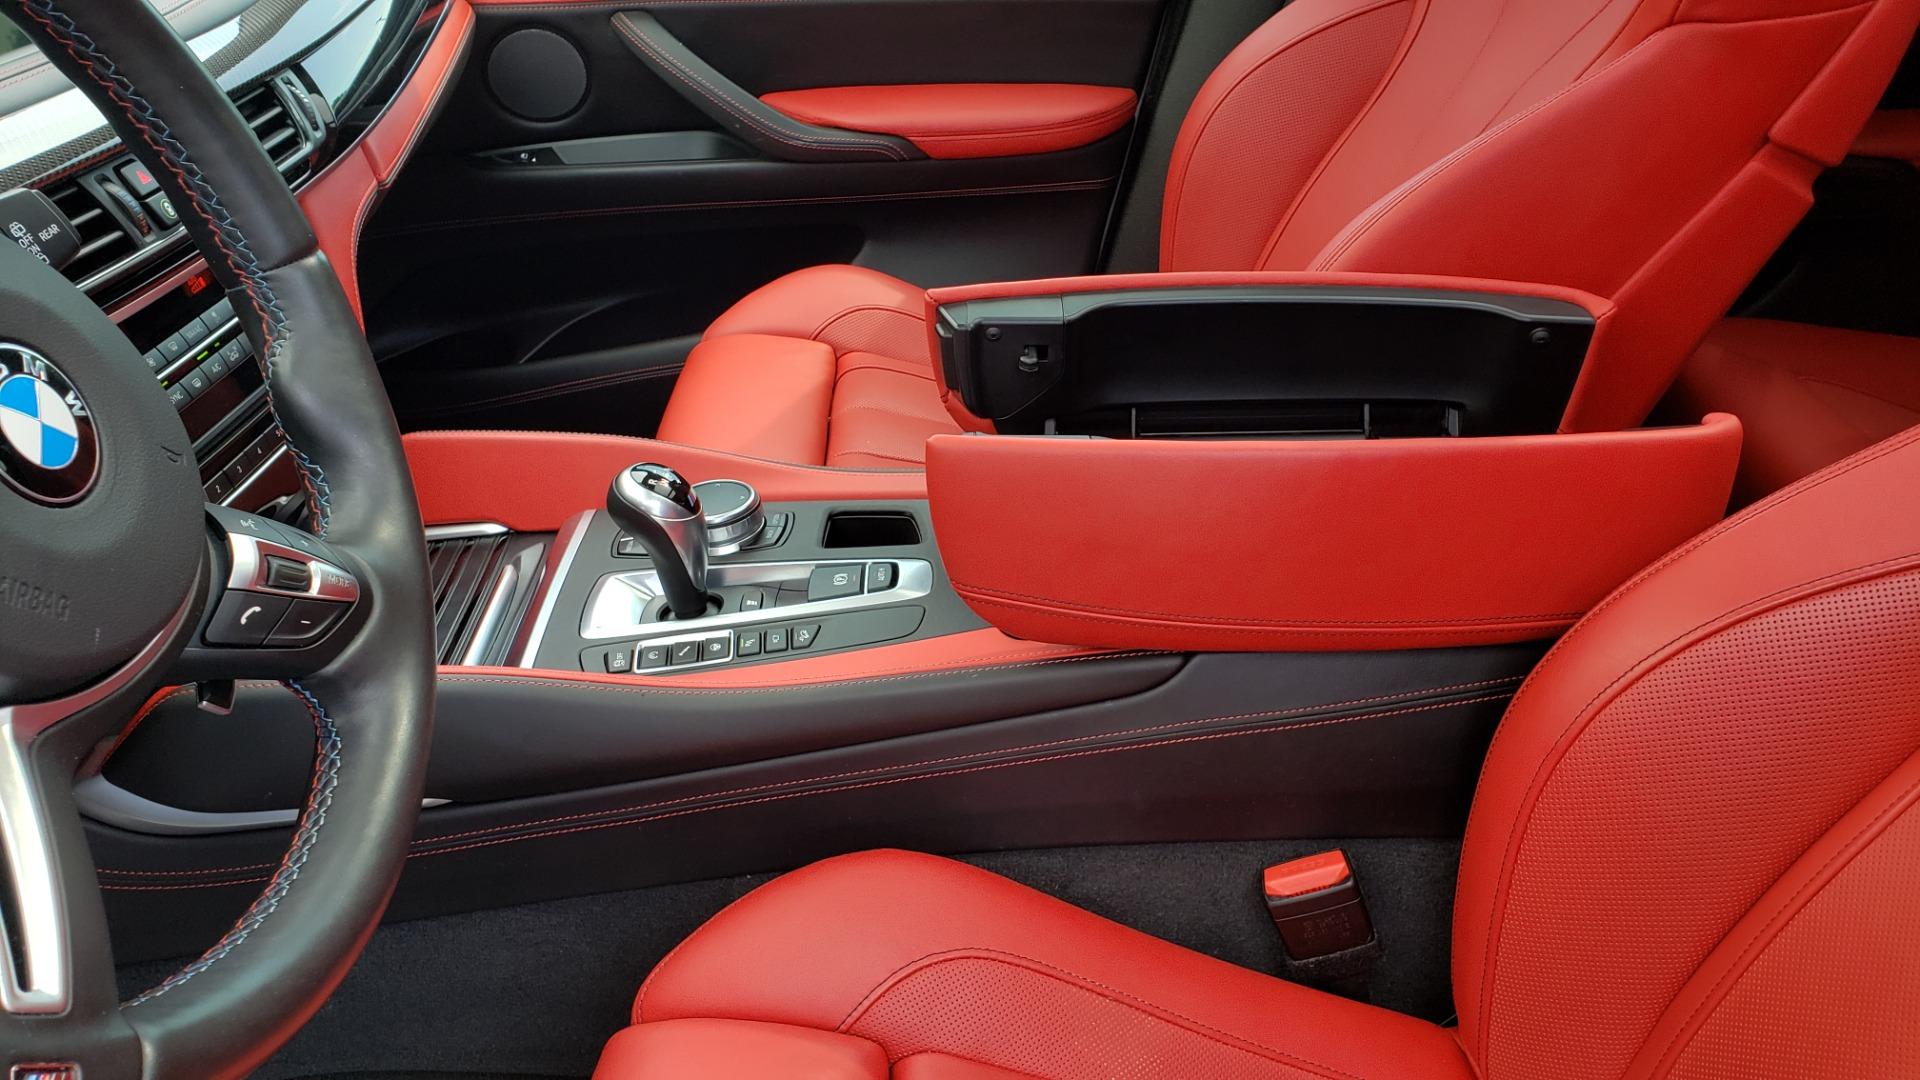 Used 2017 BMW X5 M EXECUTIVE PKG / NAV / DRVR ASST / BSM / HUD / HTD STS / WIFI for sale Sold at Formula Imports in Charlotte NC 28227 59